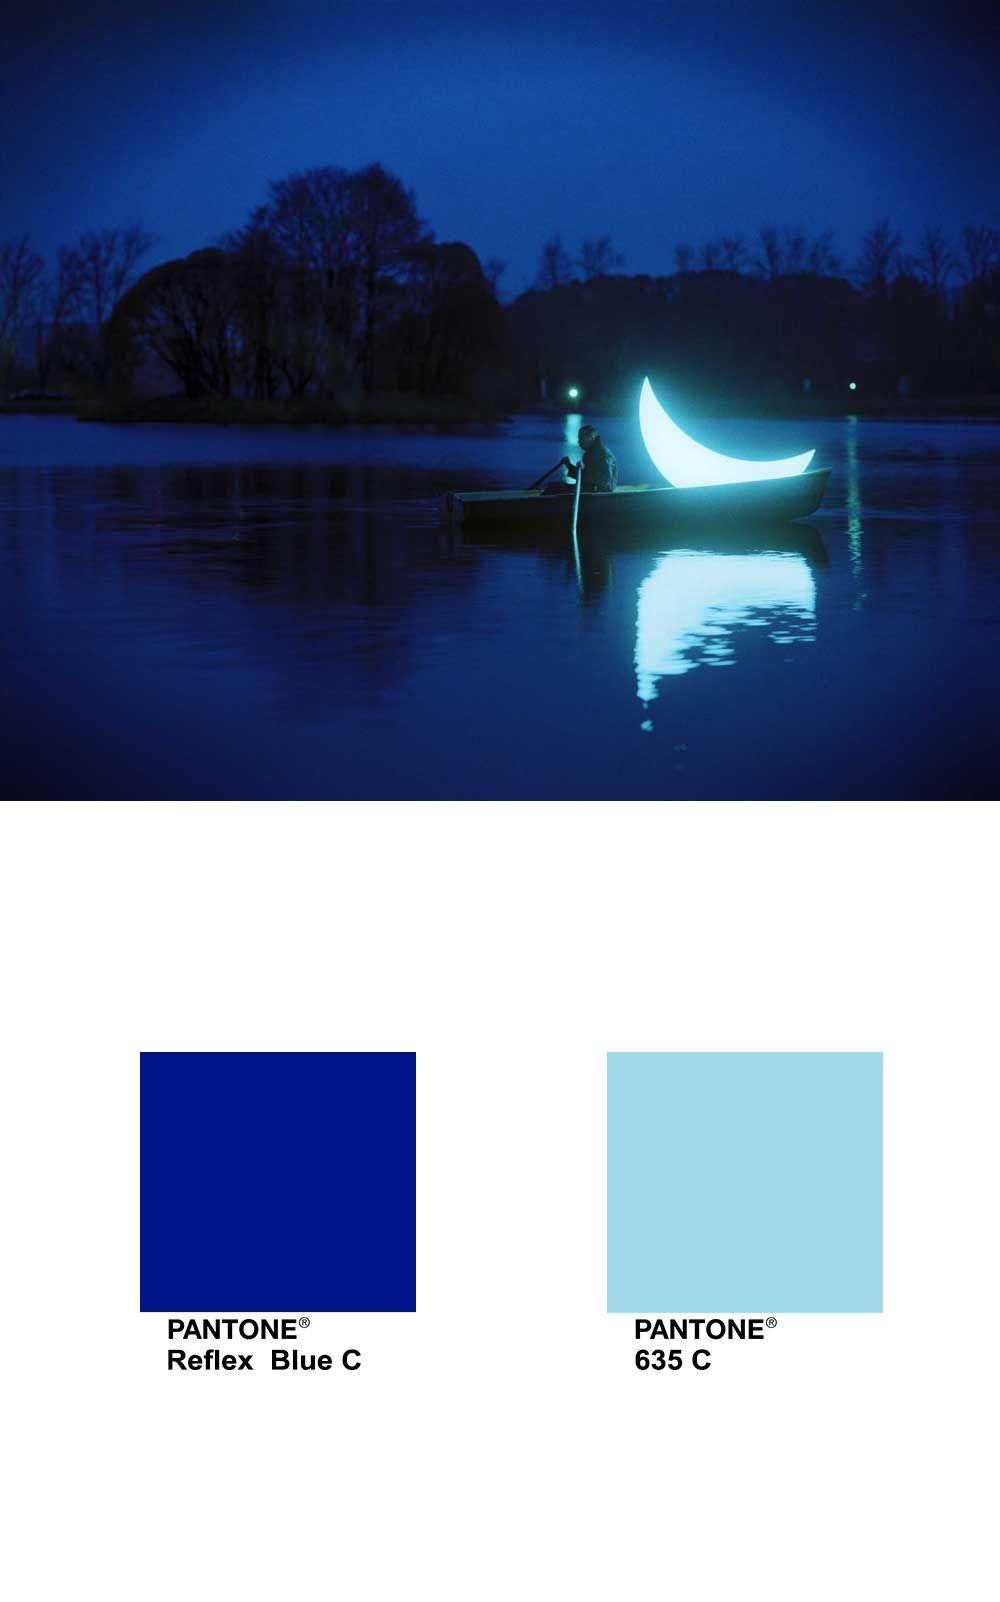 private moon   leonid tishkov pantone reflex blue c pantone 635 c